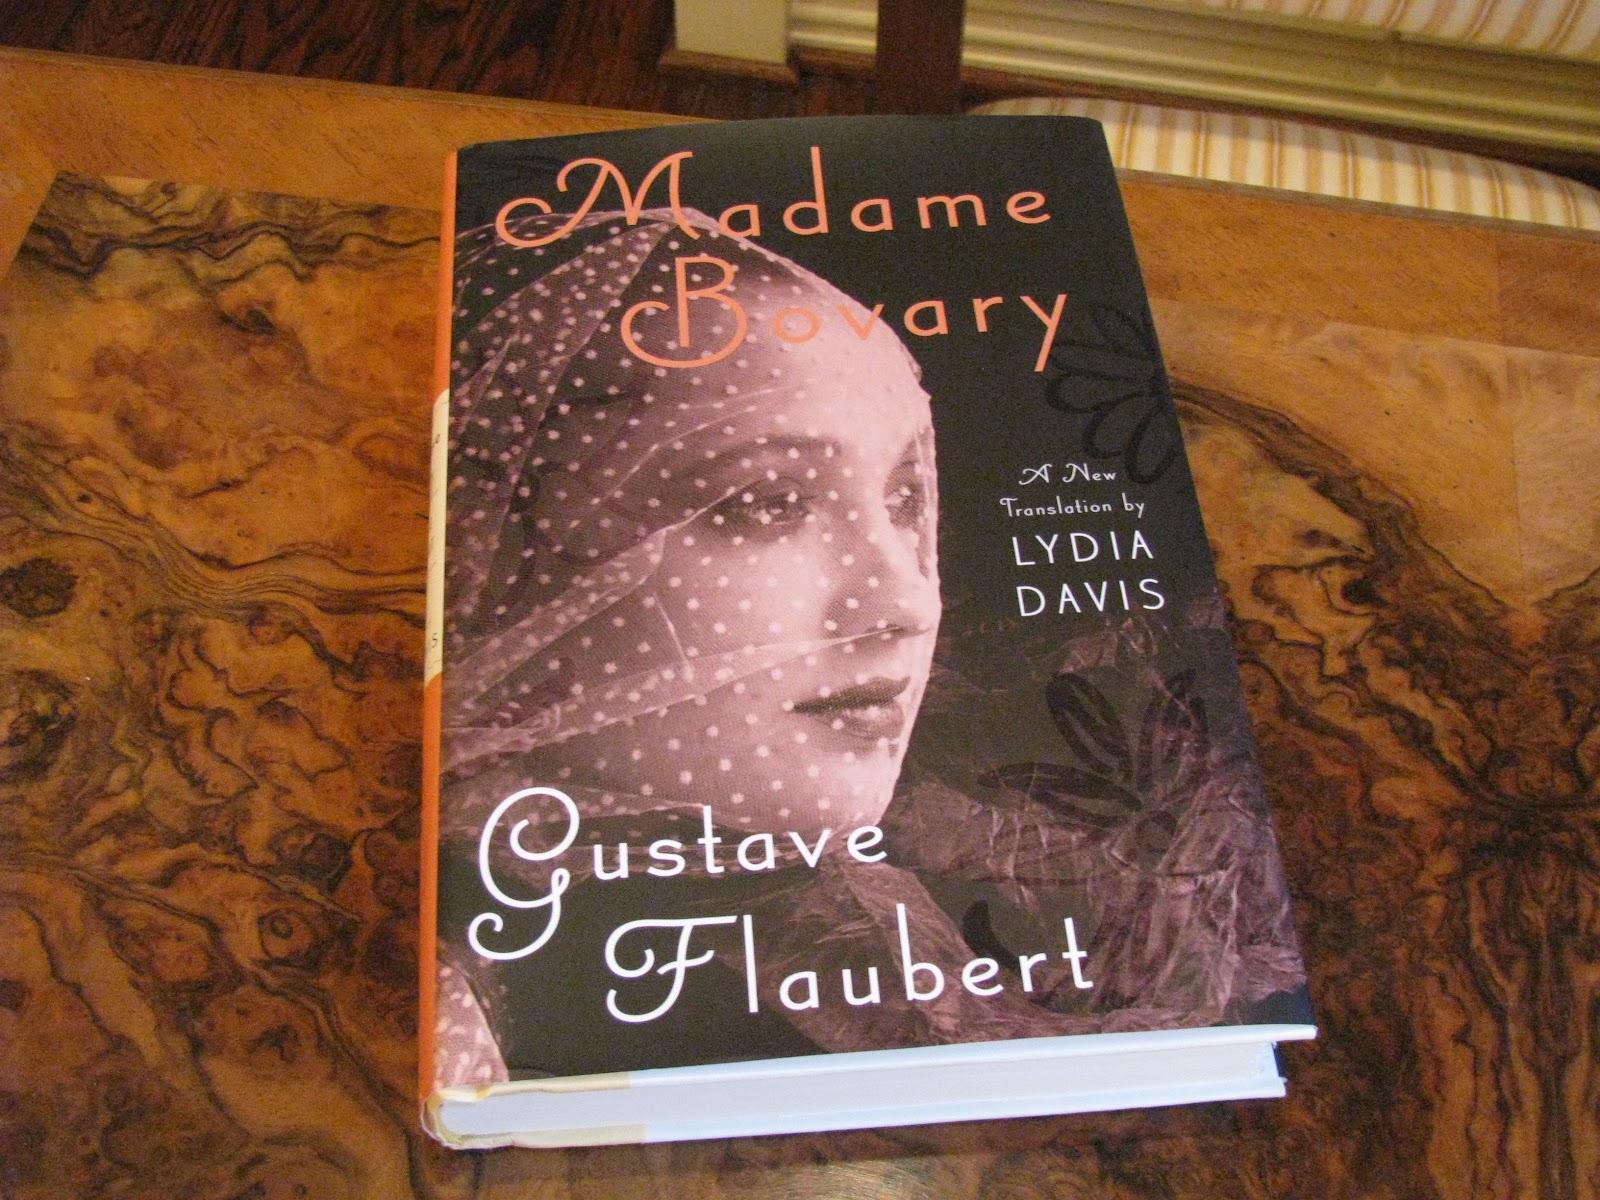 madame bovary gustave flaubert